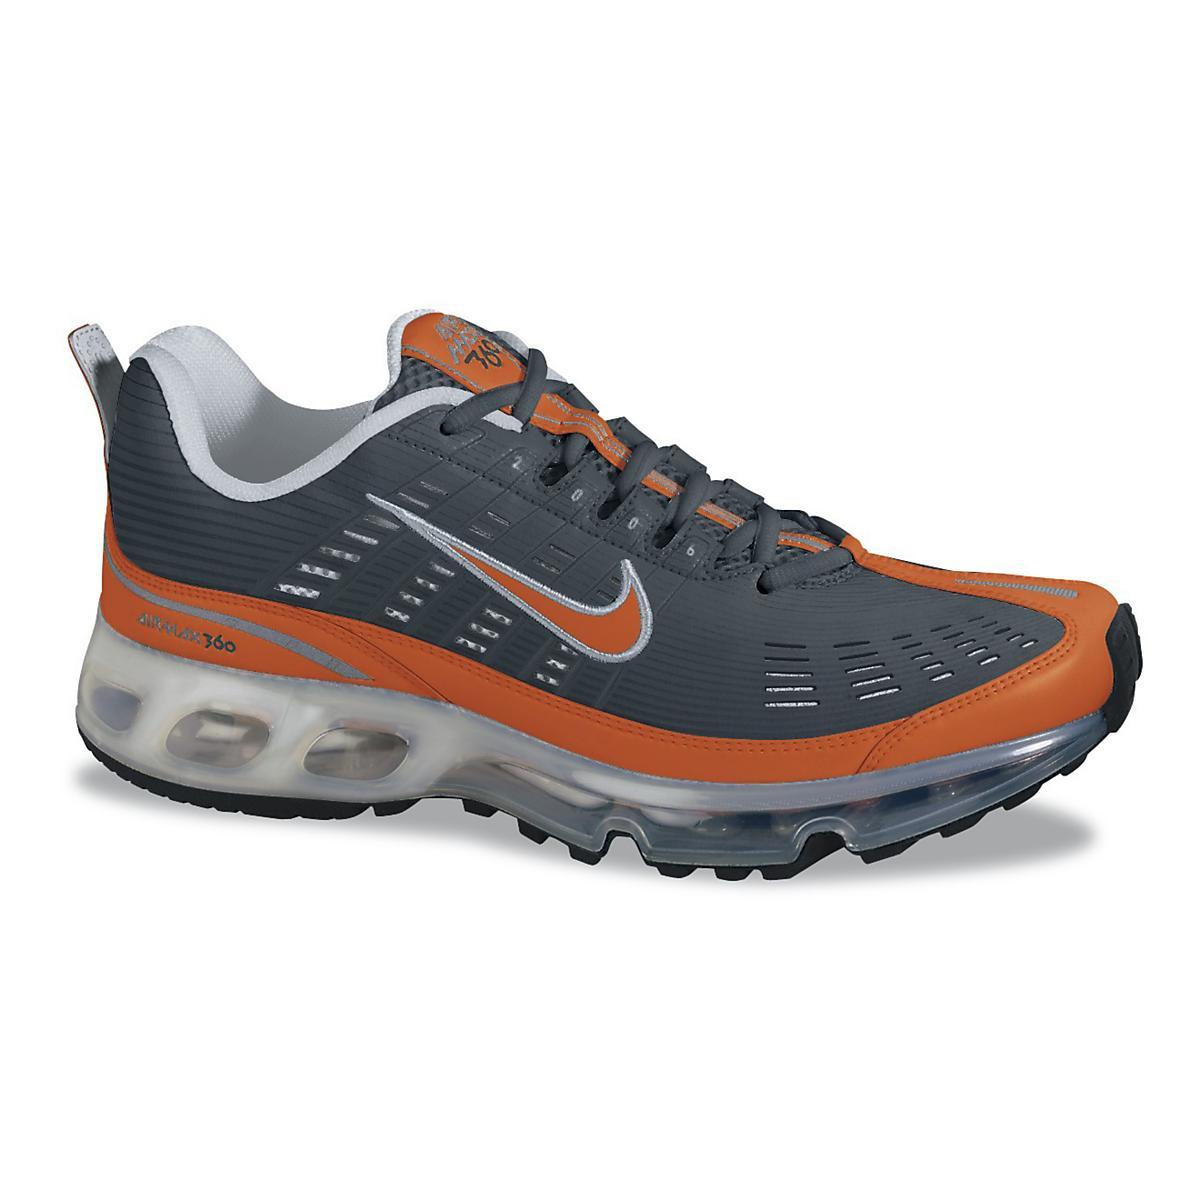 reputable site f662c 64cdf Mens Nike Air Max 360 Running Shoe at Road Runner Sports